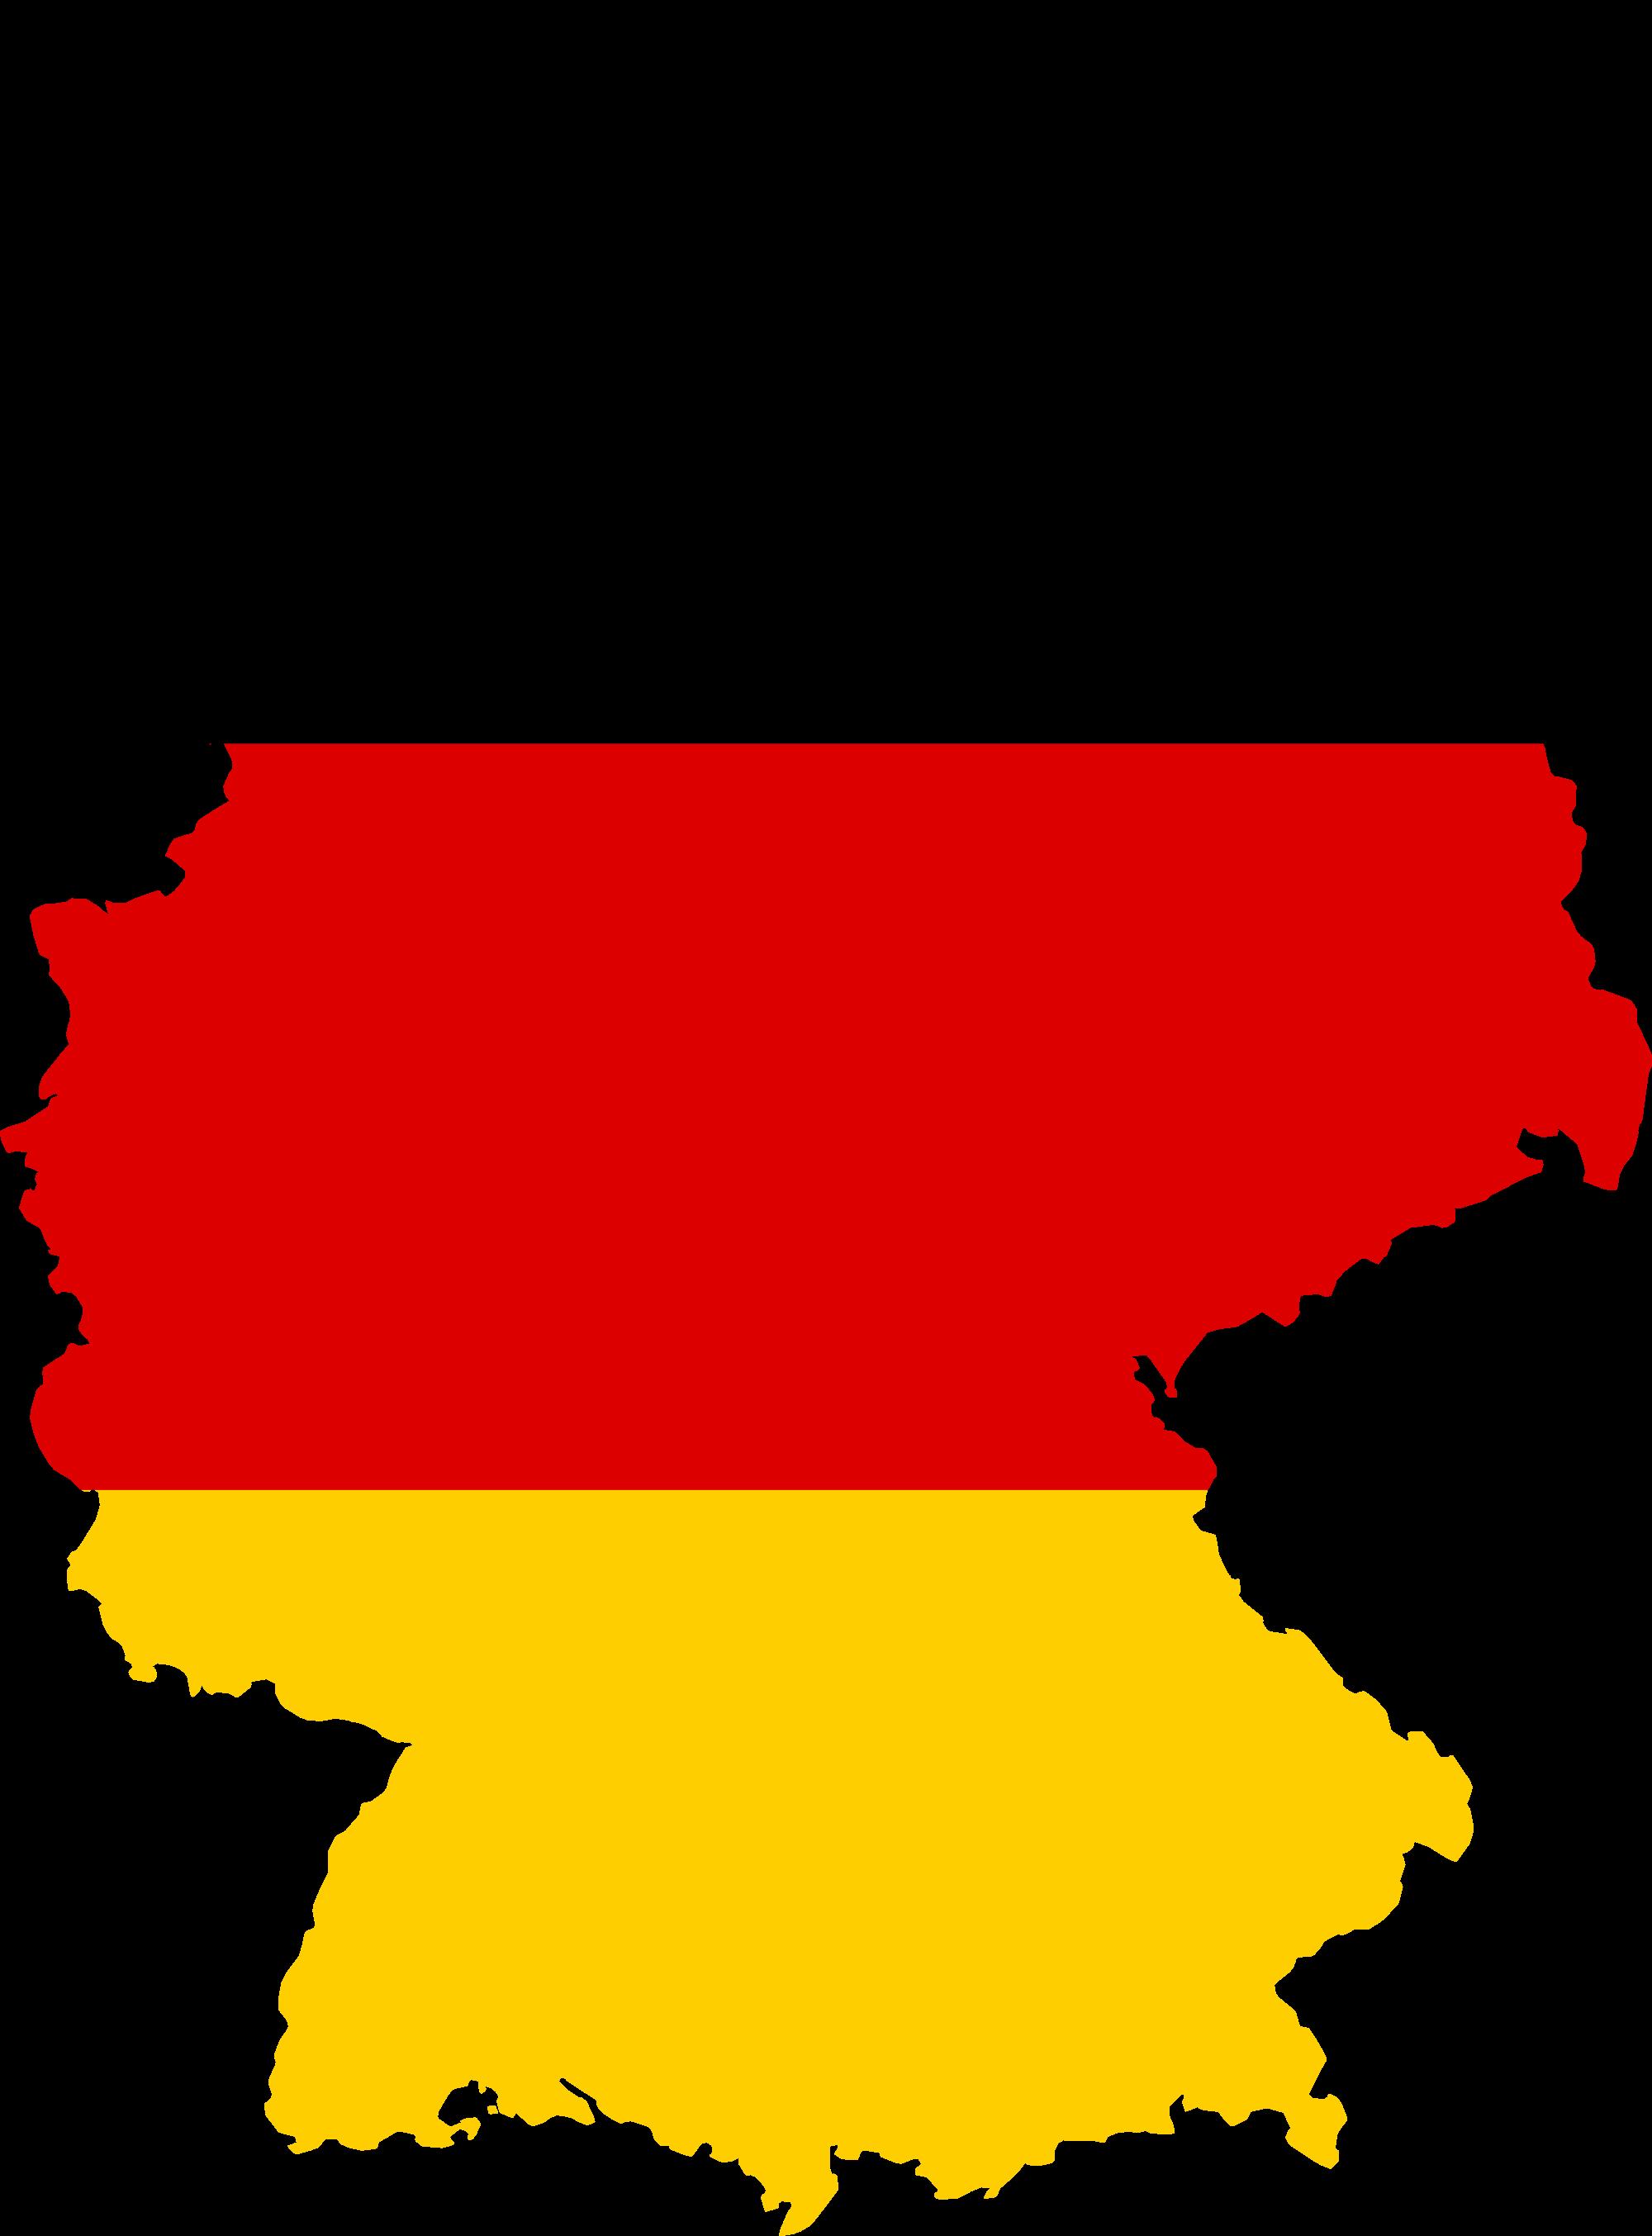 Flag Of Germany HD wallpapers, Desktop wallpaper - most viewed